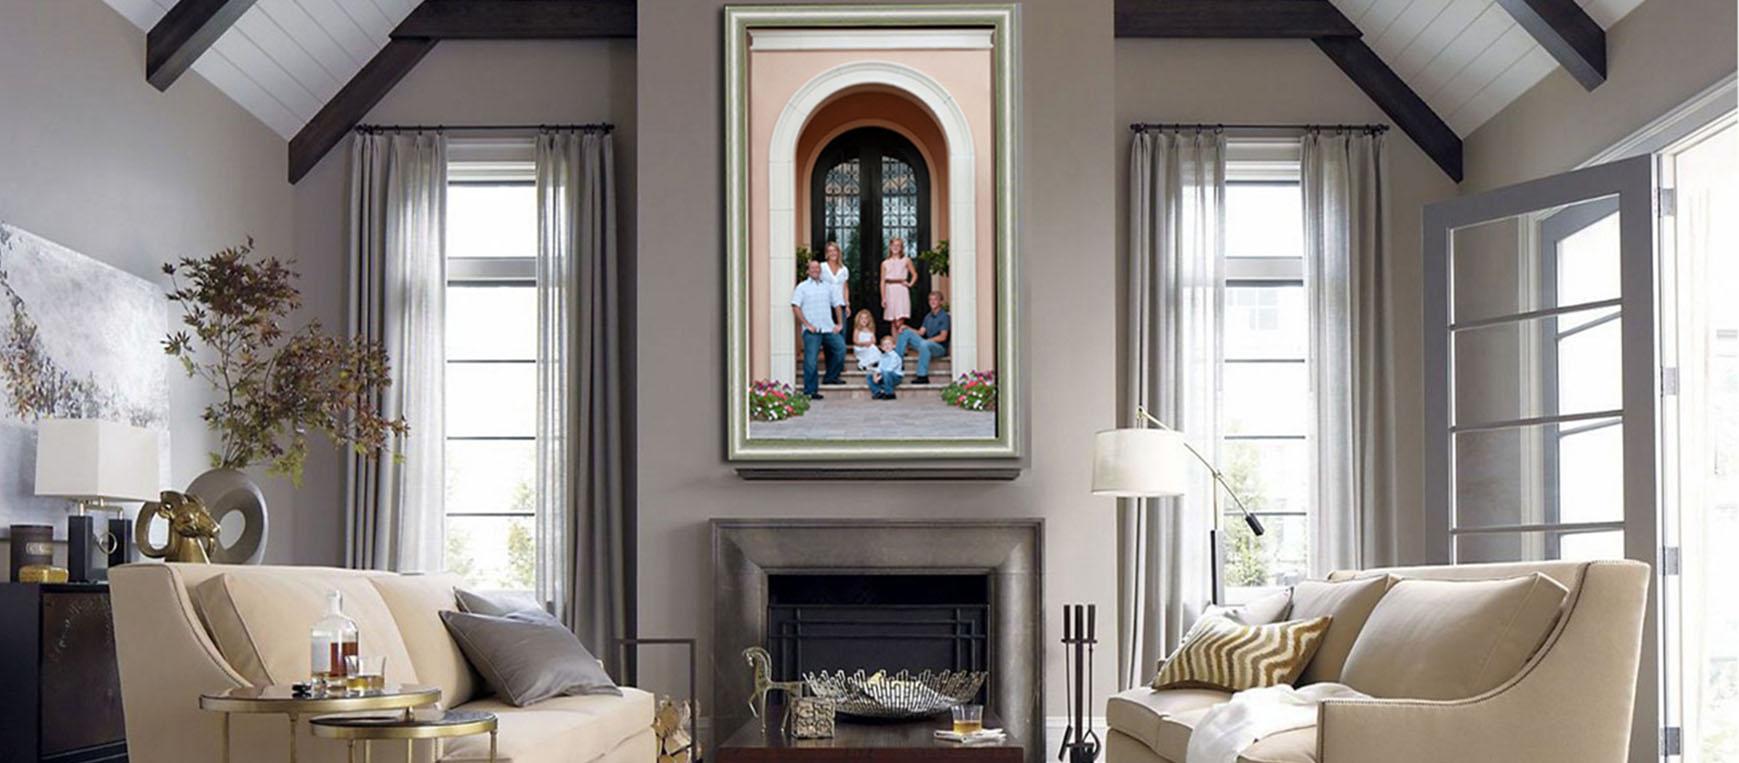 Environmental-Family-Portrait-at-the-home-Cruz-Portrait-Design